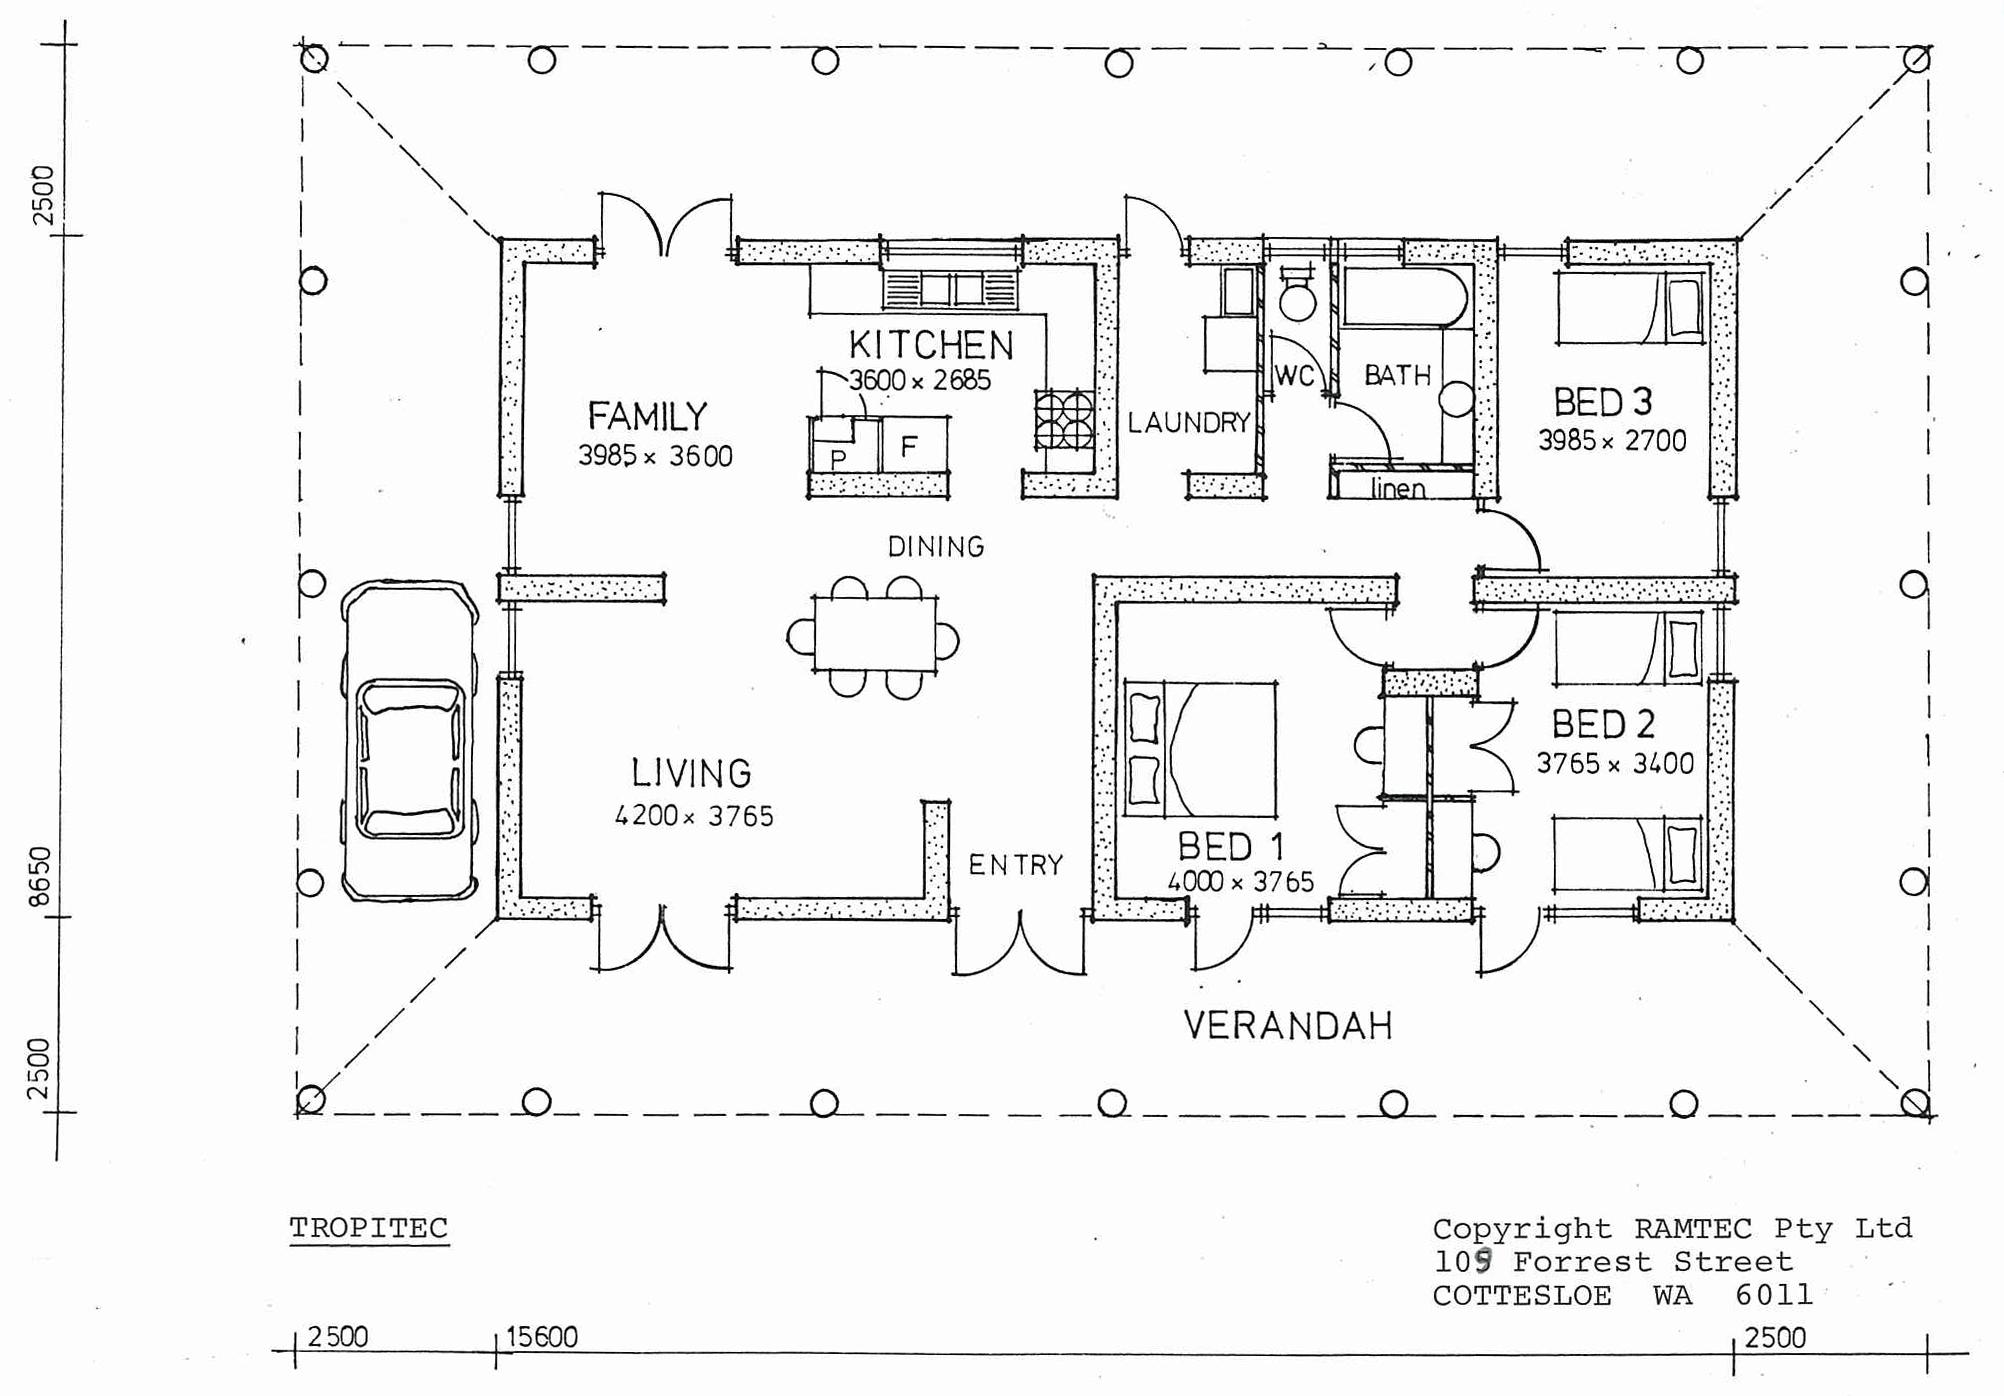 6c51fdfc4b8f4bd4832df0f74bf80ac5 Rammed Earth Tiny House Plans on tiny prefab house plans, tiny stucco house plans, tiny house house plans, tiny timber frame house plans, tiny passive house plans,